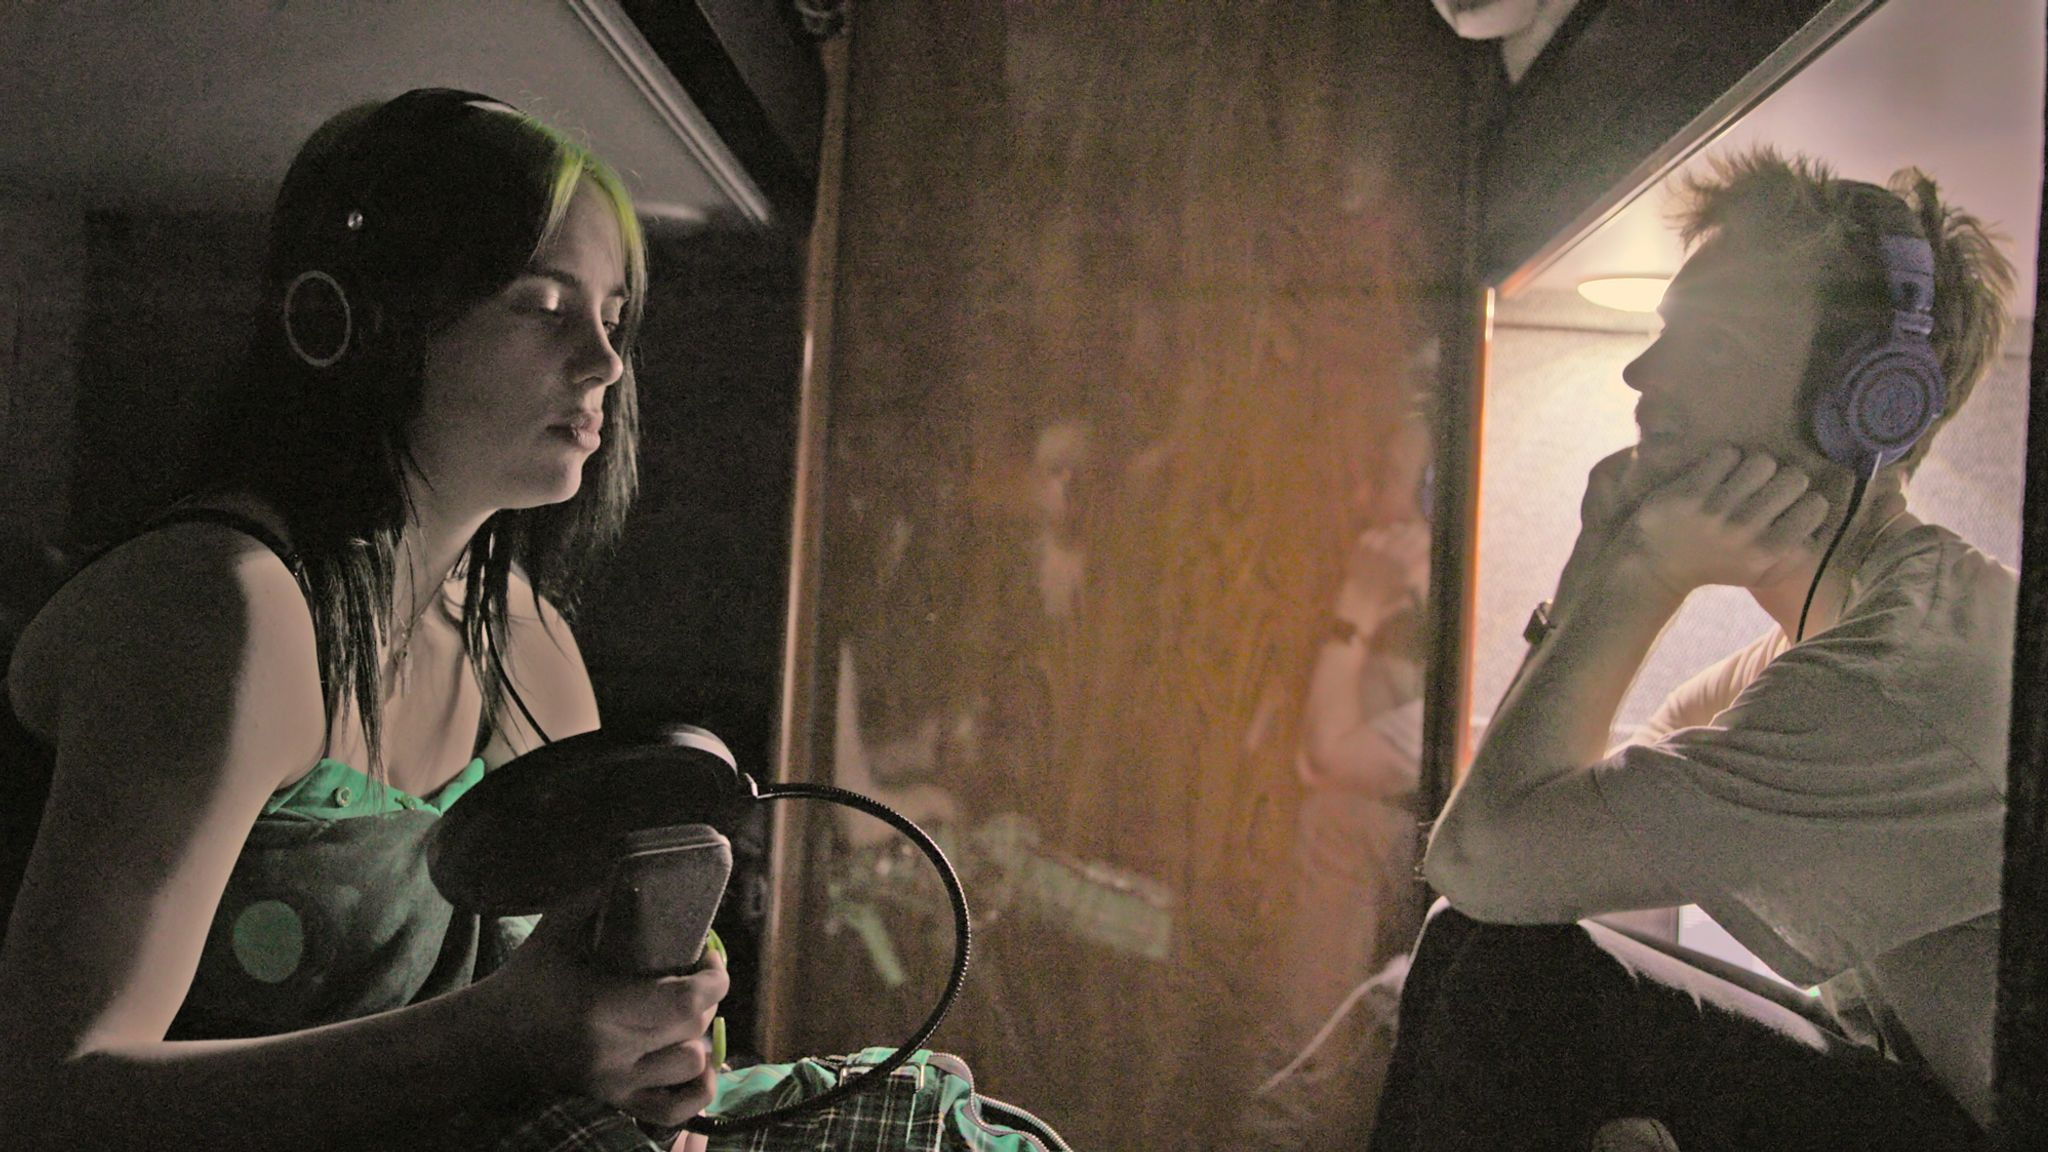 Pic: Billie Eilish: The World's A Little Blurry/Apple TV+